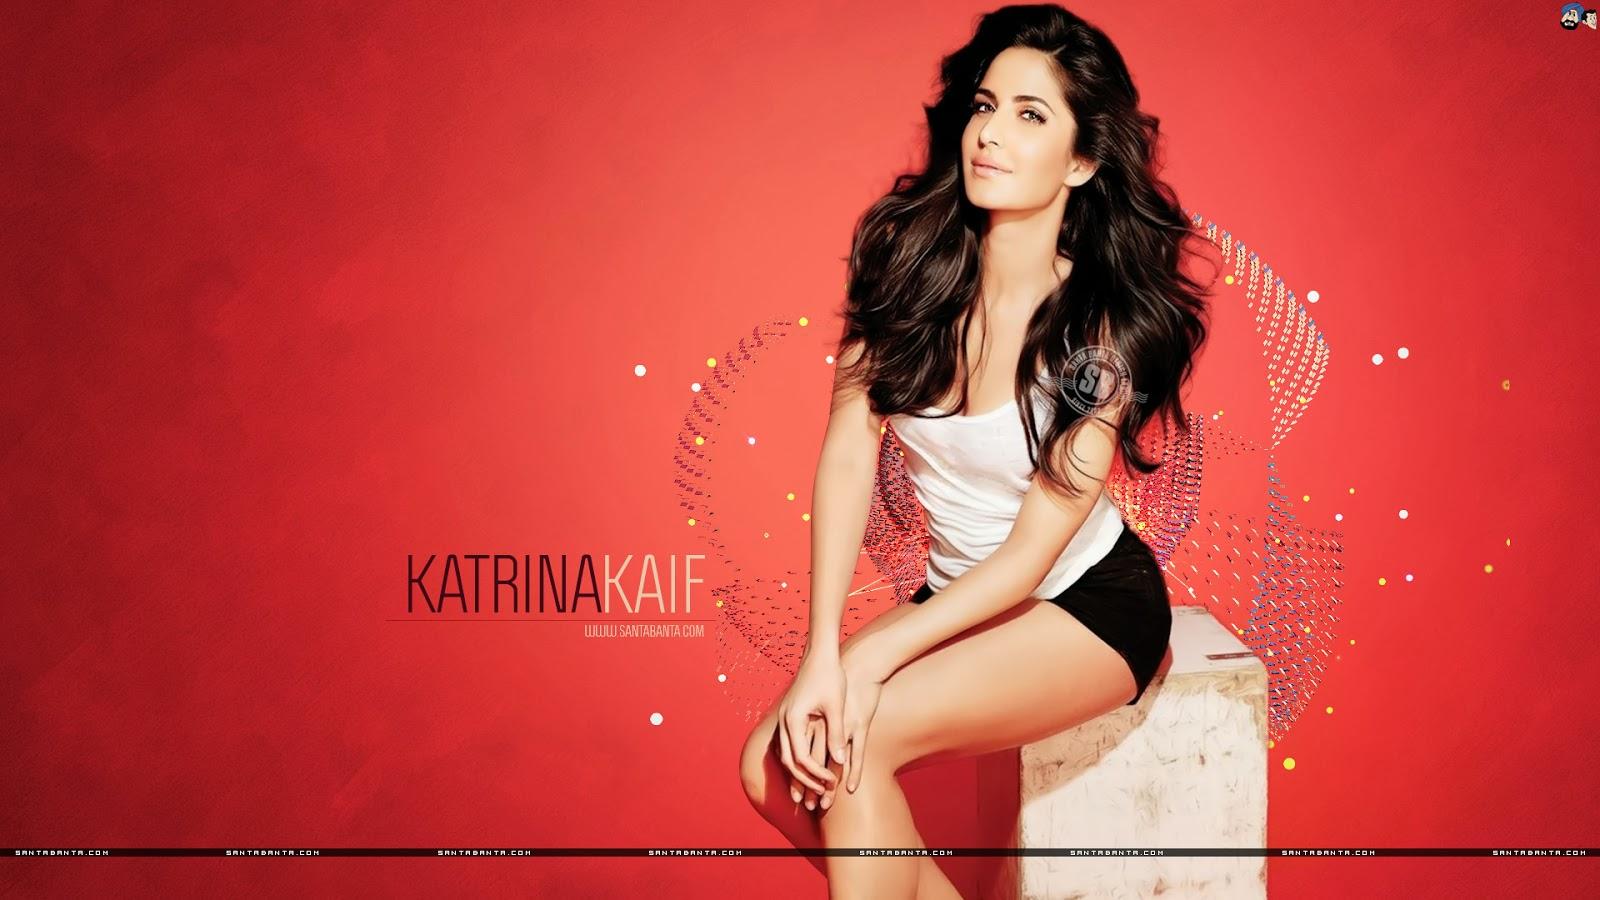 filmy enjoyment: bollywood actress katrina kaif hot pics and hd